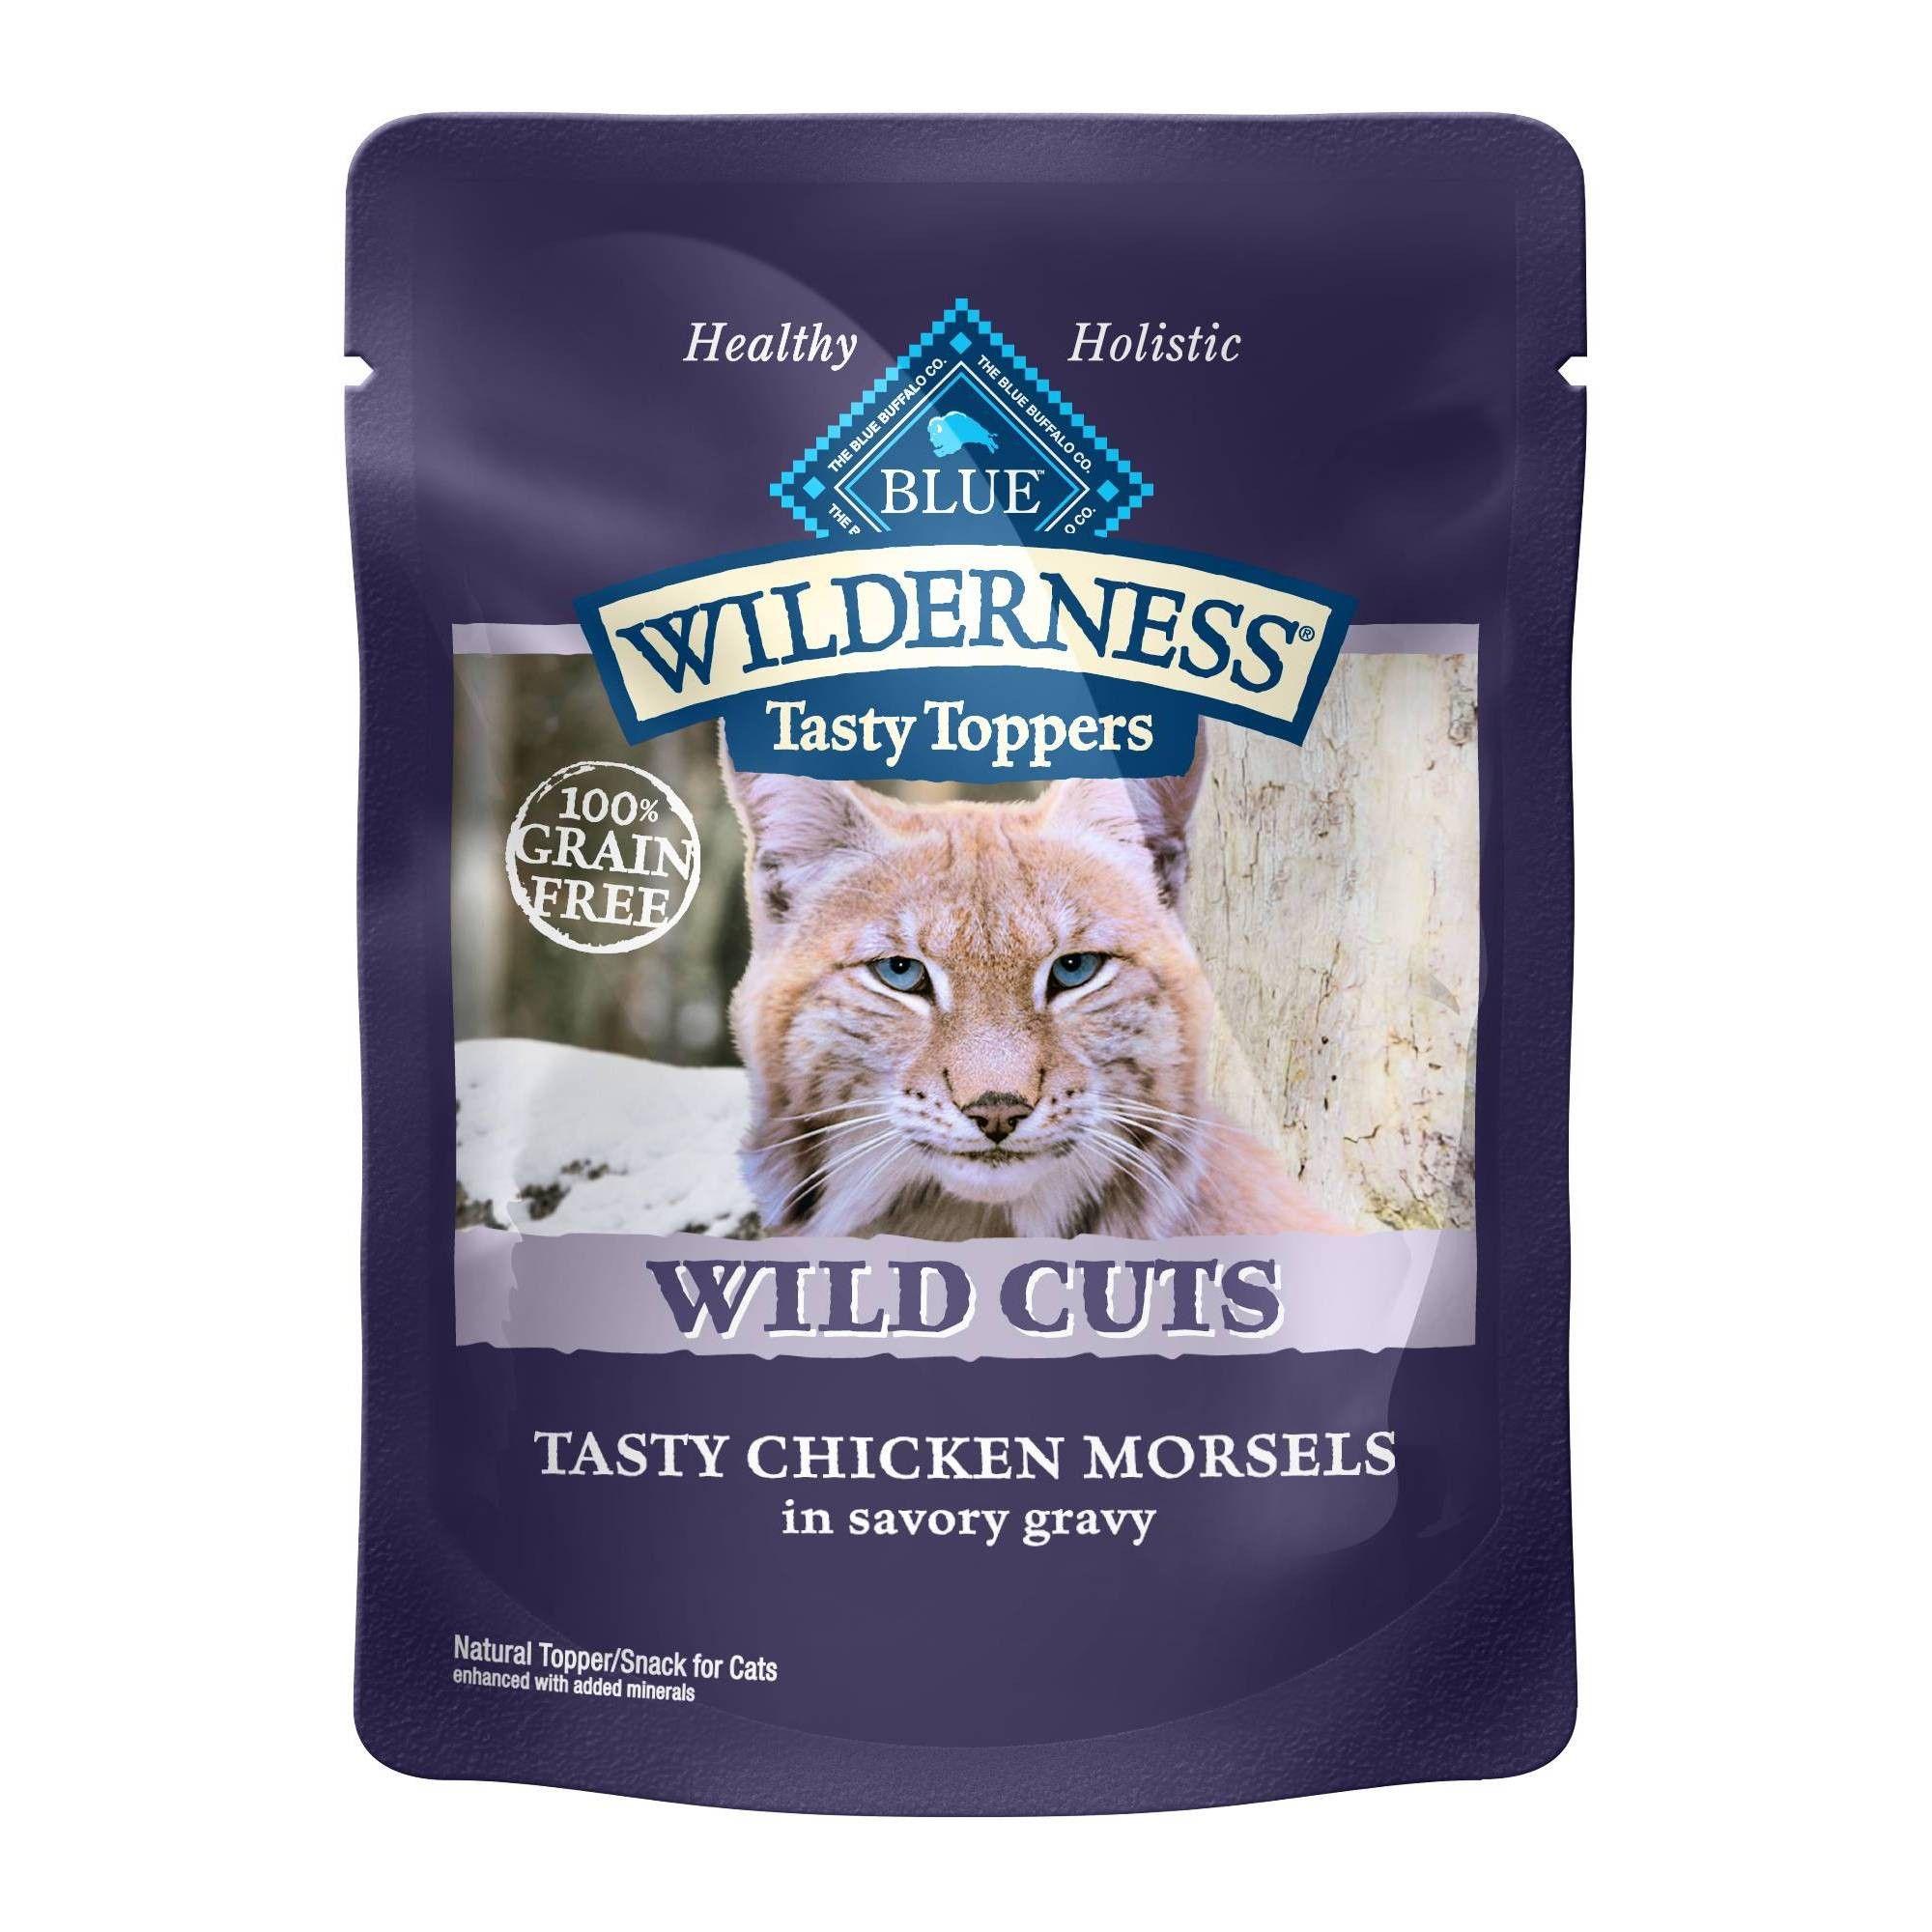 Blue Buffalo Wilderness Tasty Chicken Morsels Gravy Wet Cat Food 24pk 3oz In 2020 Cat Food Canned Cat Food Dry Cat Food